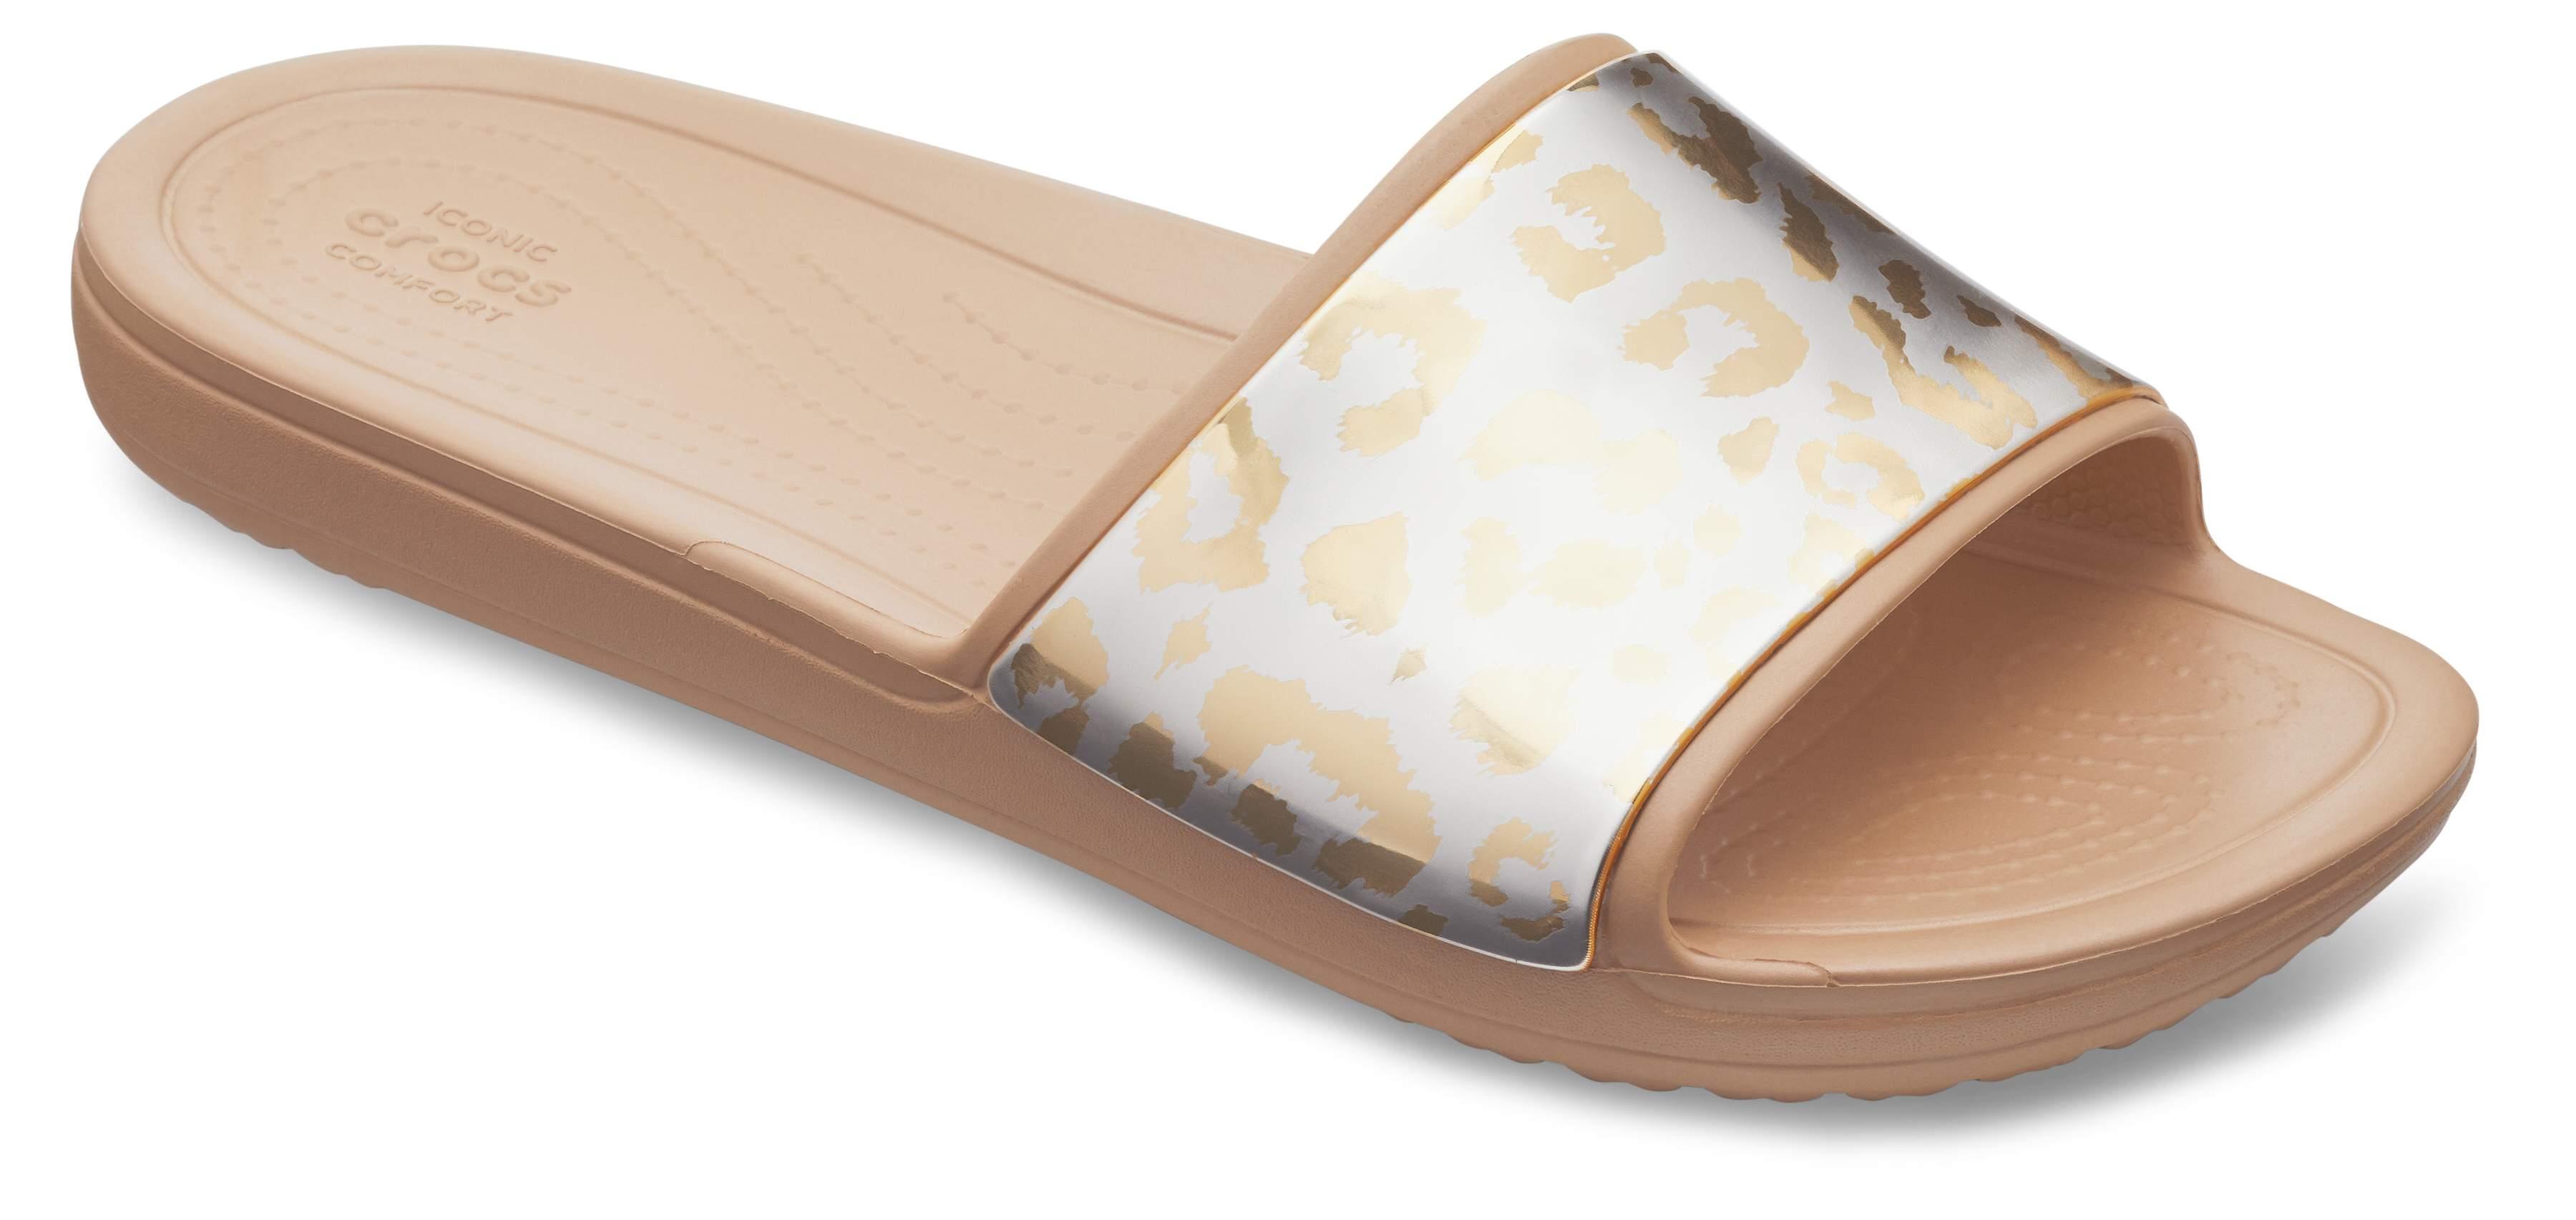 Sloane Graphic Metallic Slide Crocs